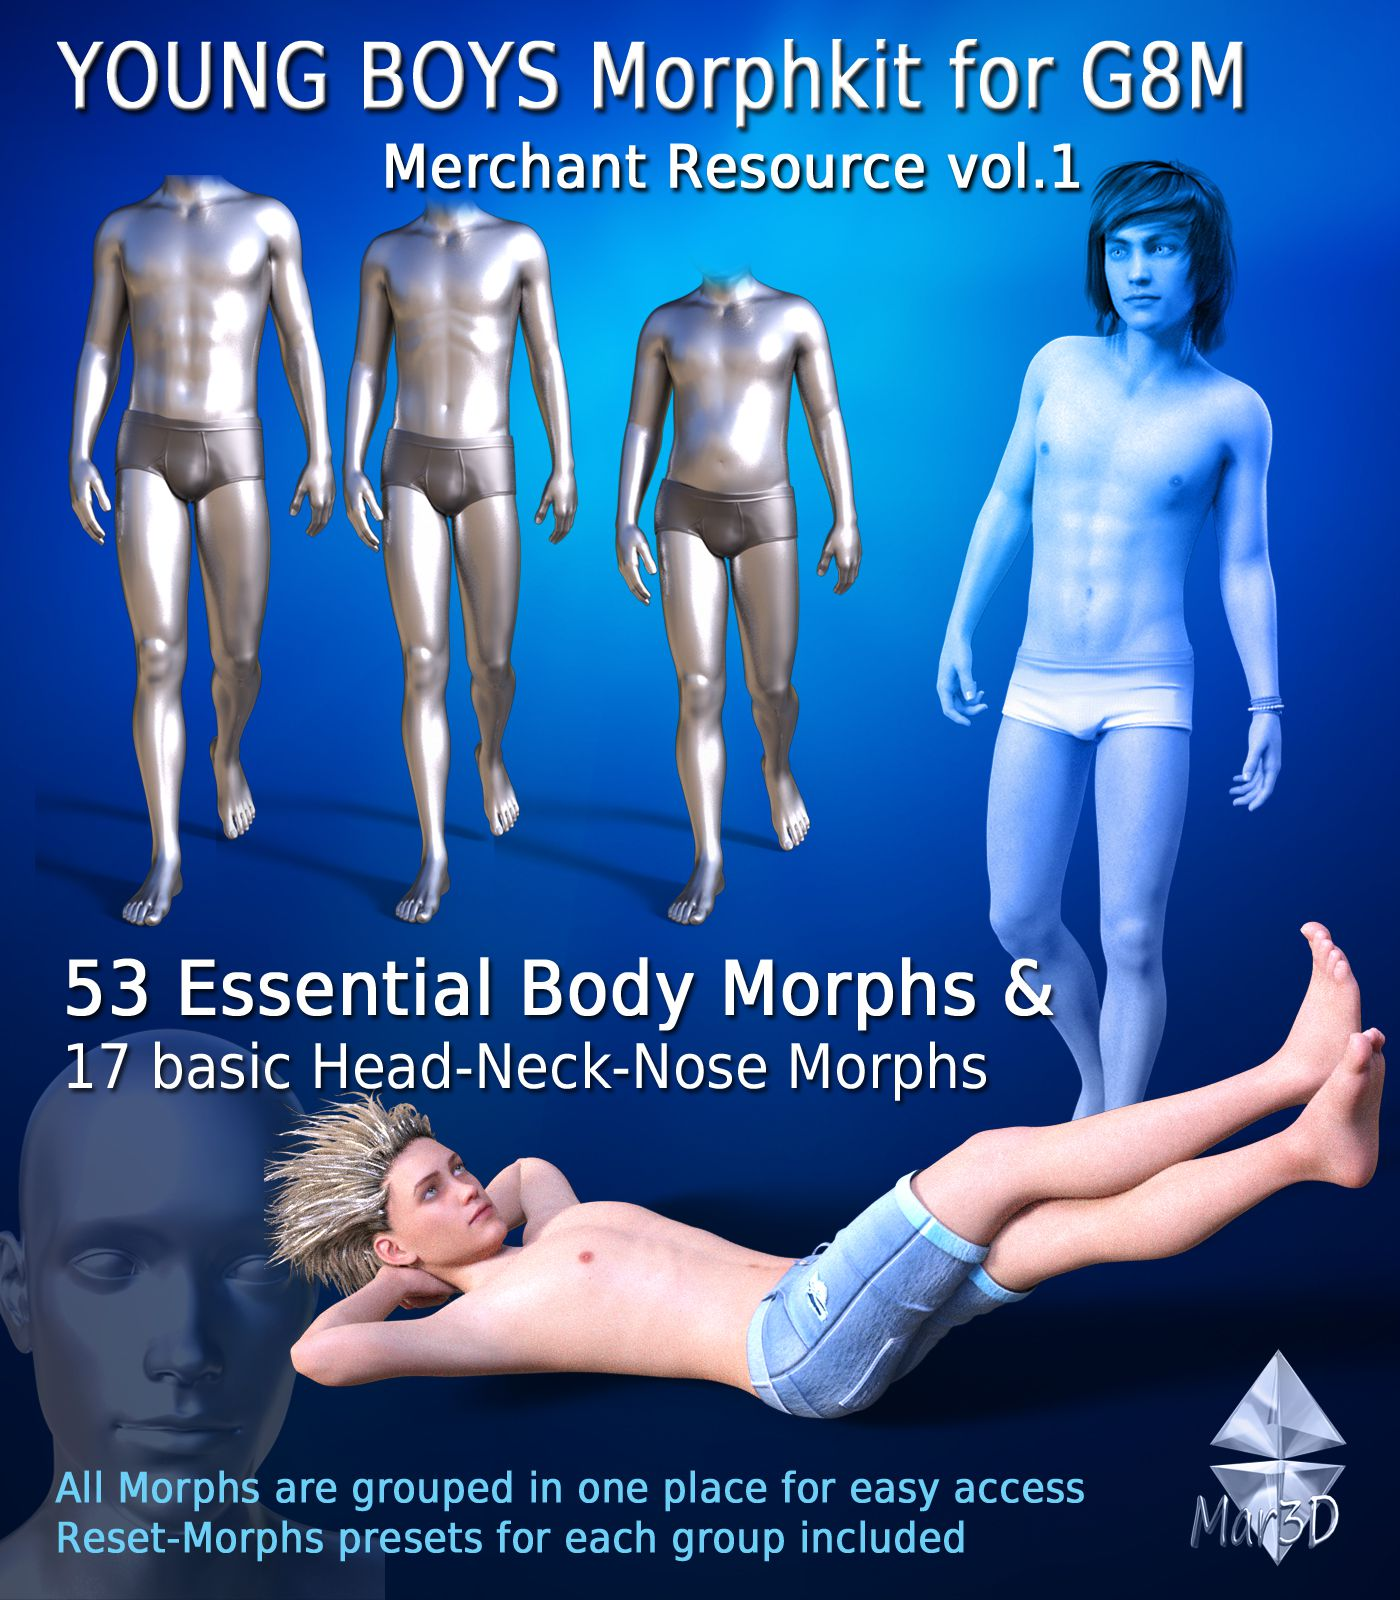 Young Boys Morphkit for G8M – Merchant Resource 1_DAZ3D下载站